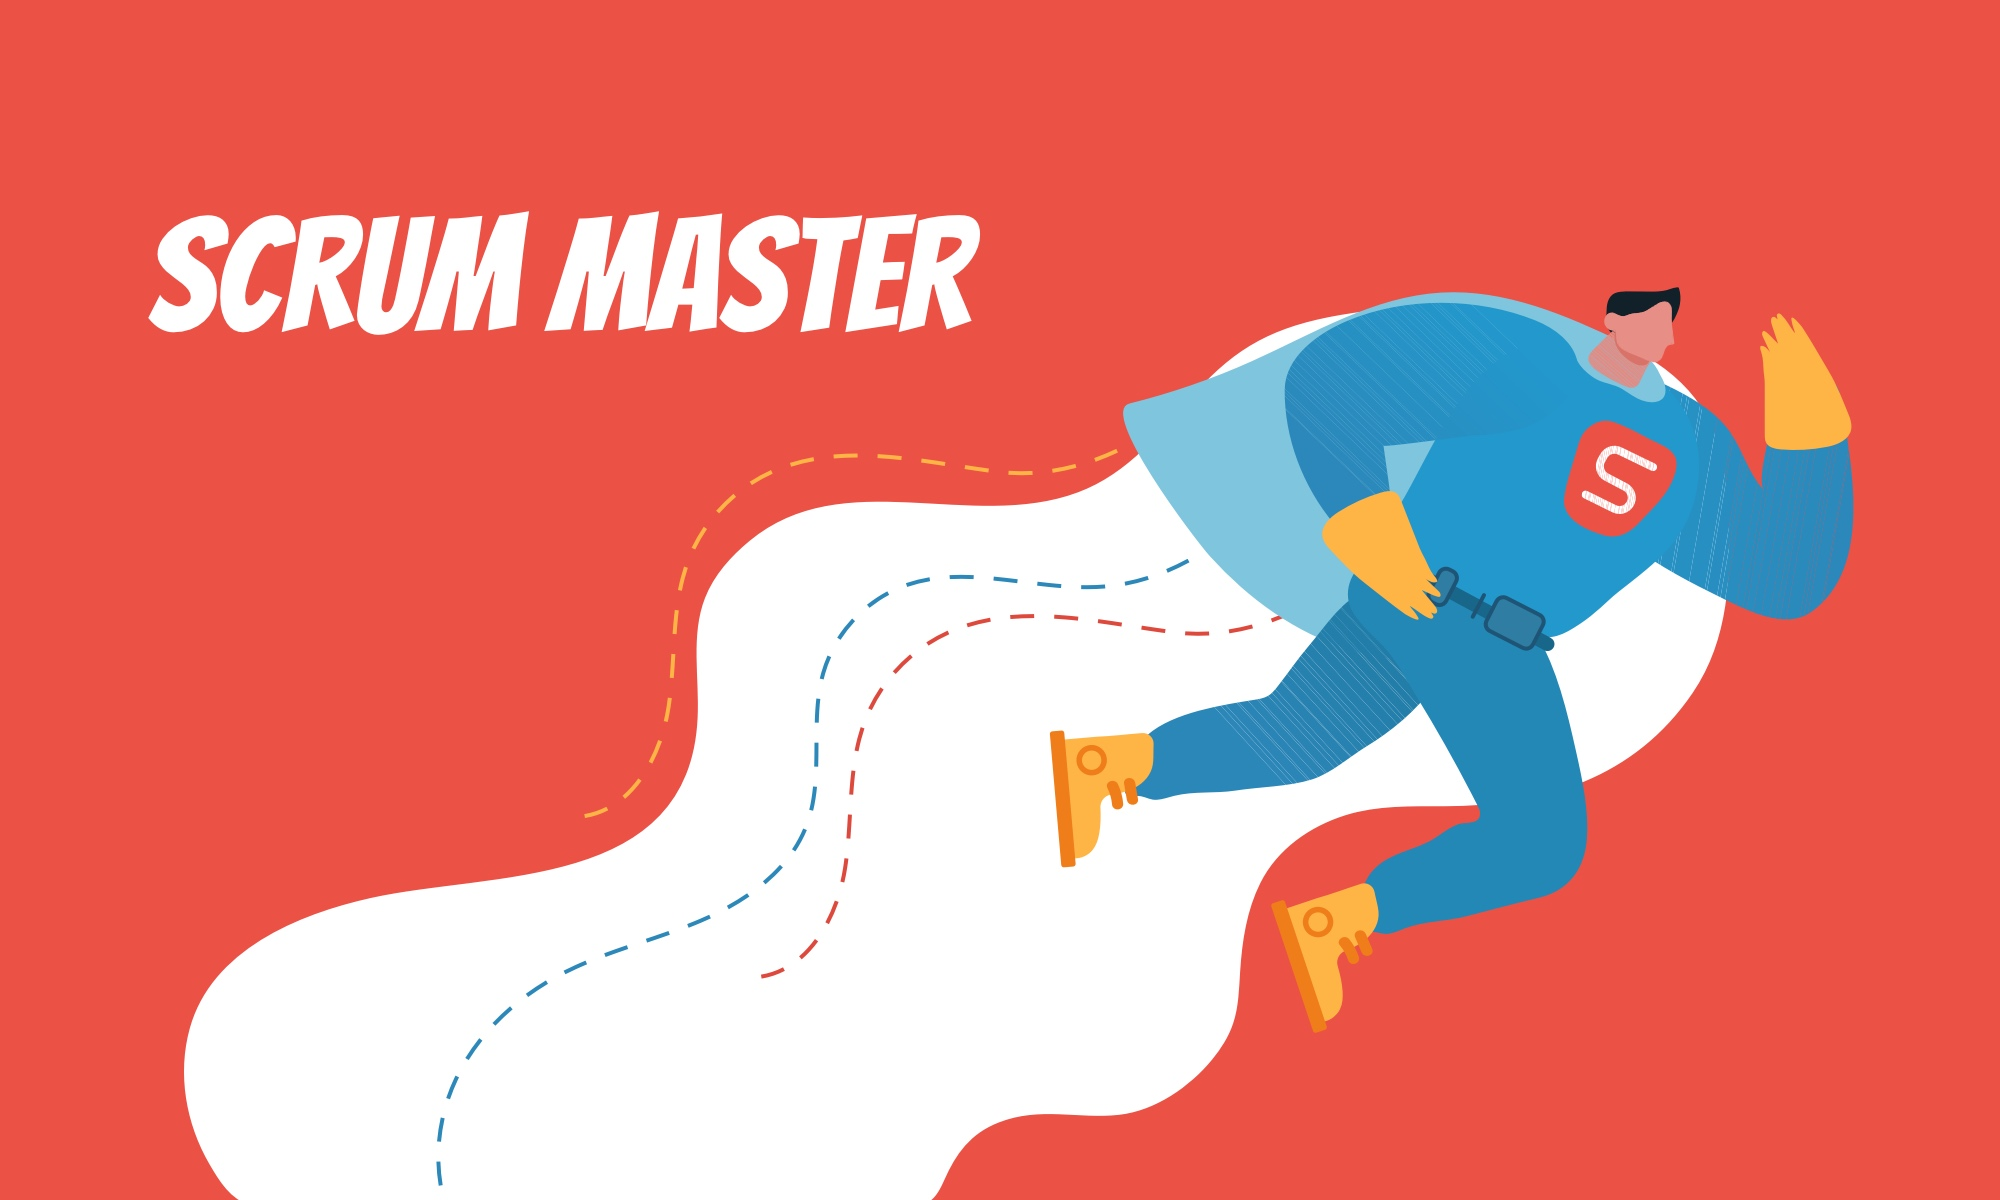 Scrum MAster role